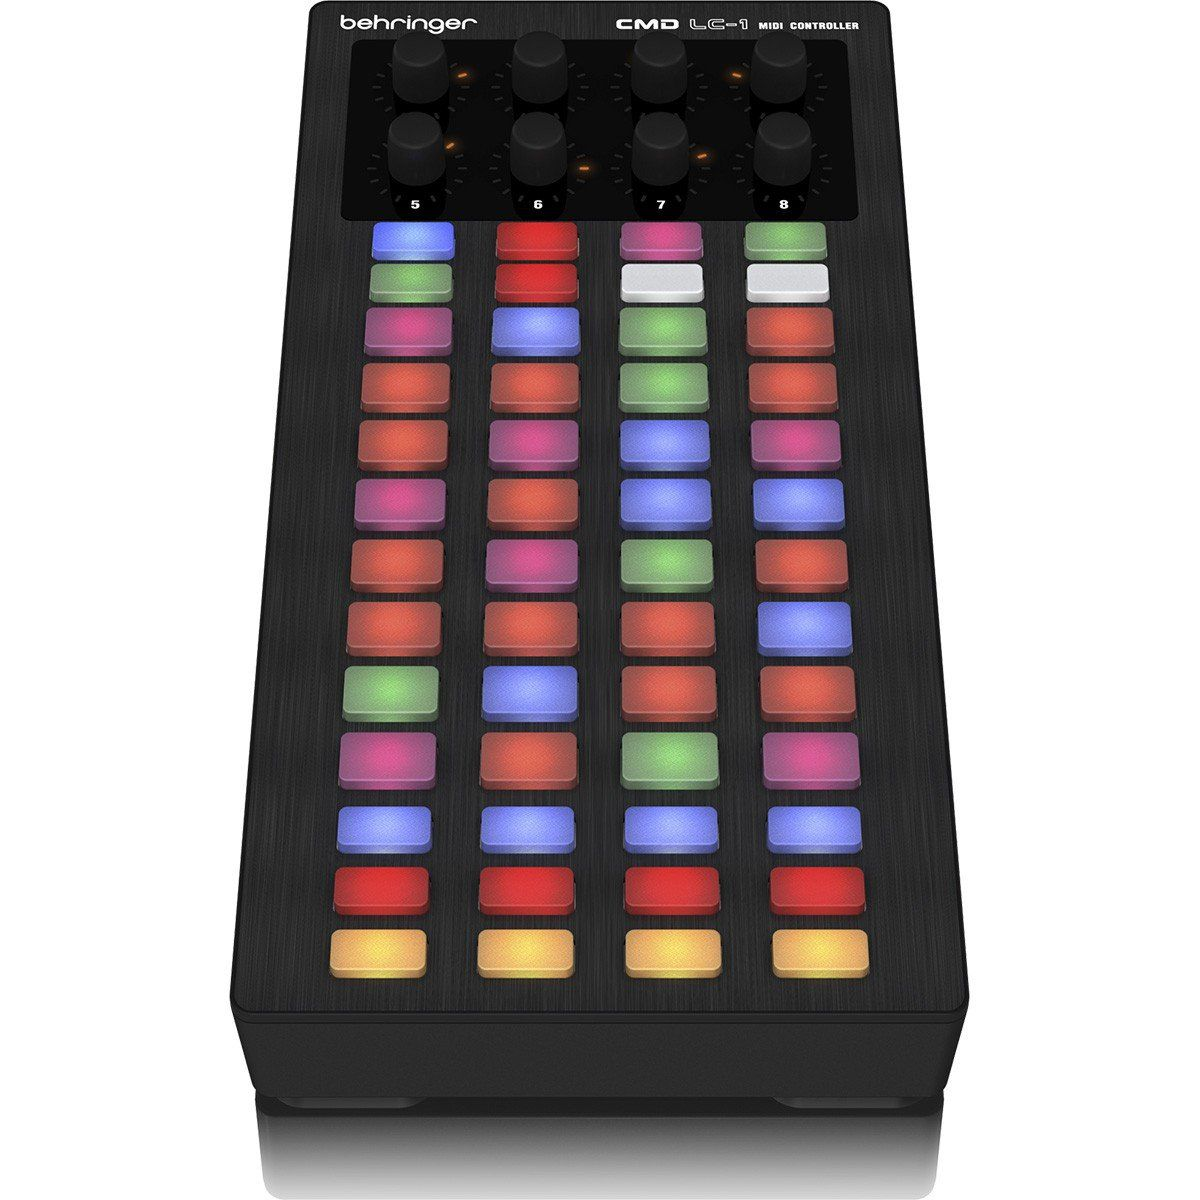 Behringer CMD LC-1 Controladora Dj CMD LC1 MIDI 4x8 Pads Usb